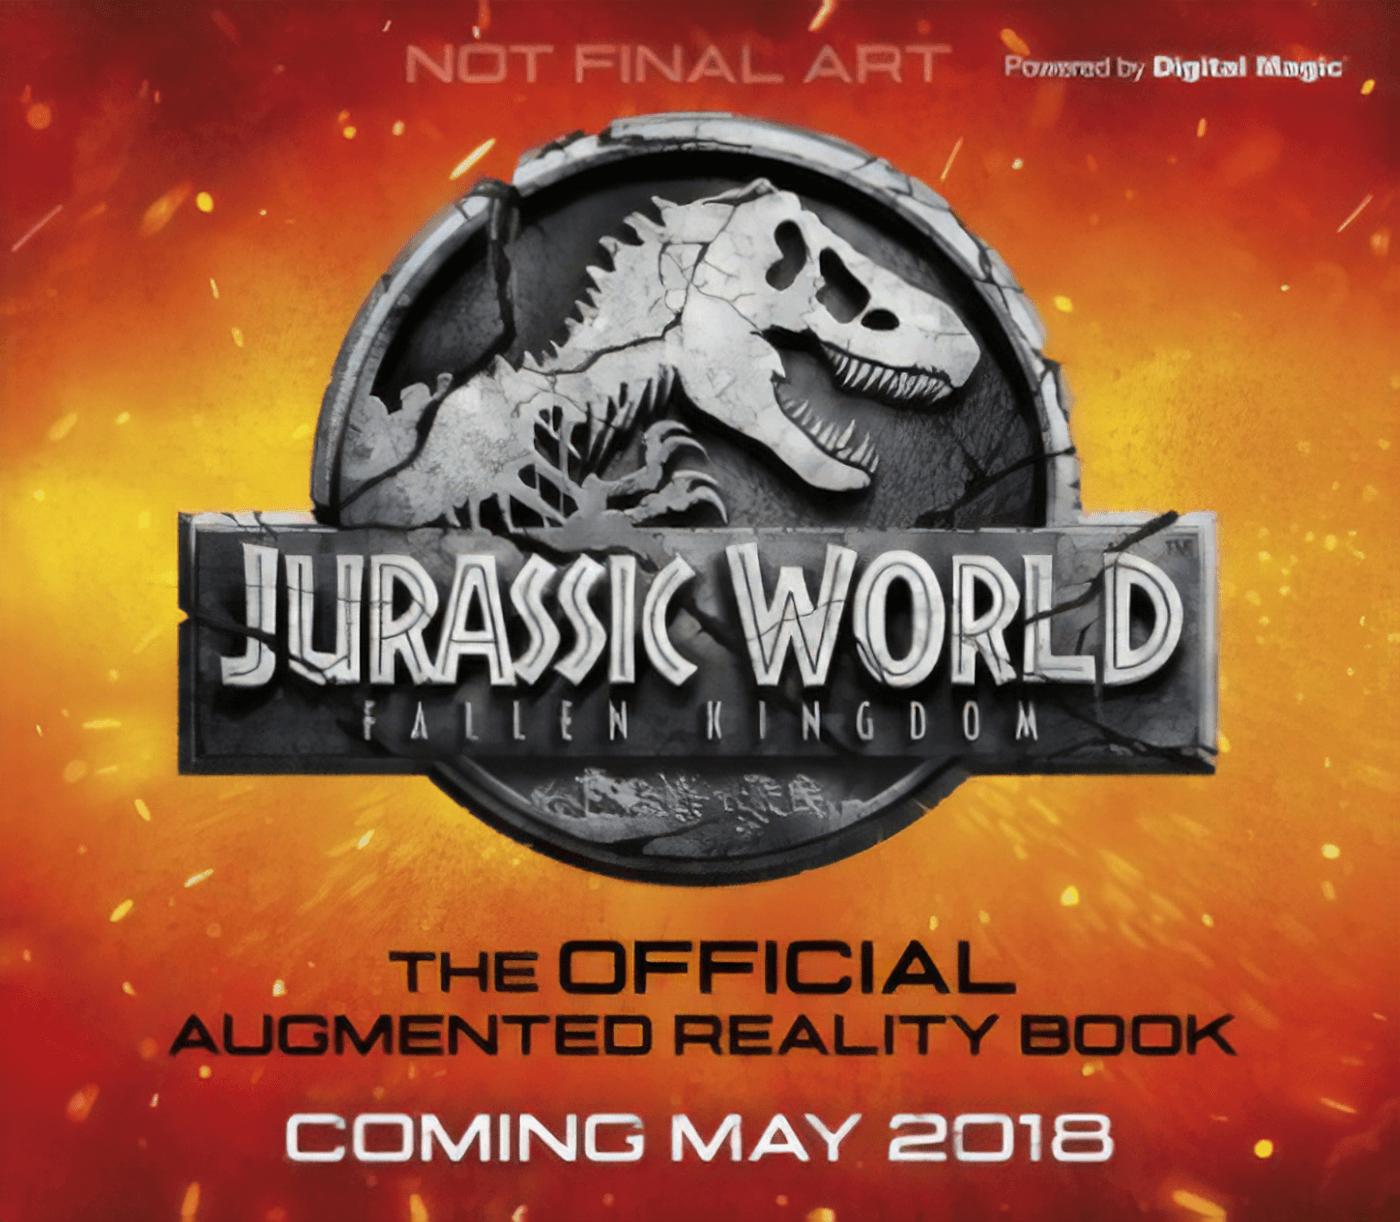 Jurassic World Fallen Kingdom Book Confirms First Film Appearance of Fan Favorite Dinosaur!